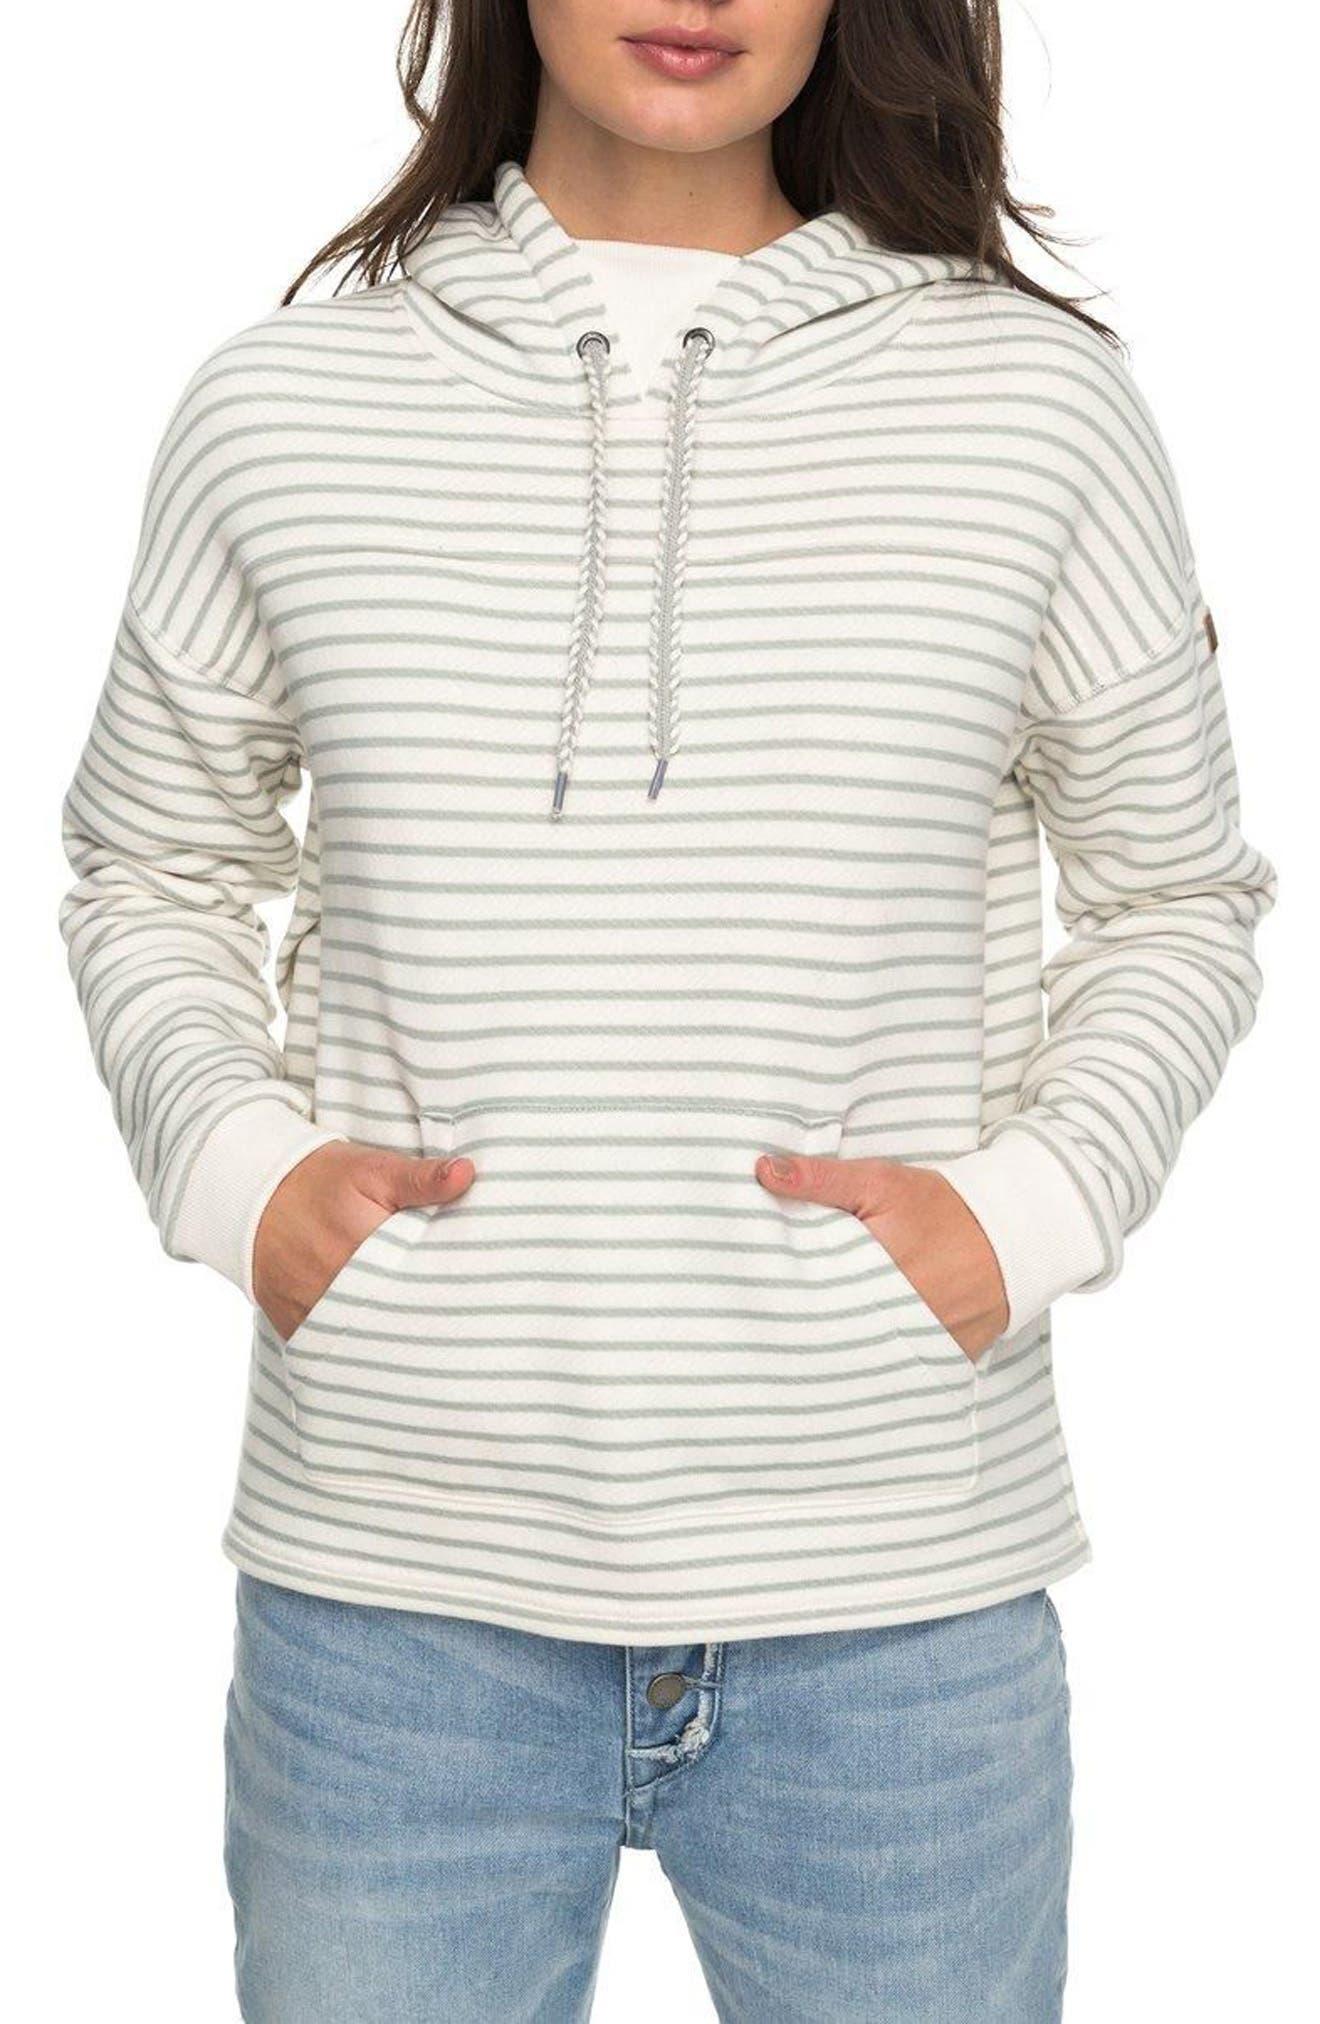 Greatest Glory Stripe Hoodie,                         Main,                         color, 101